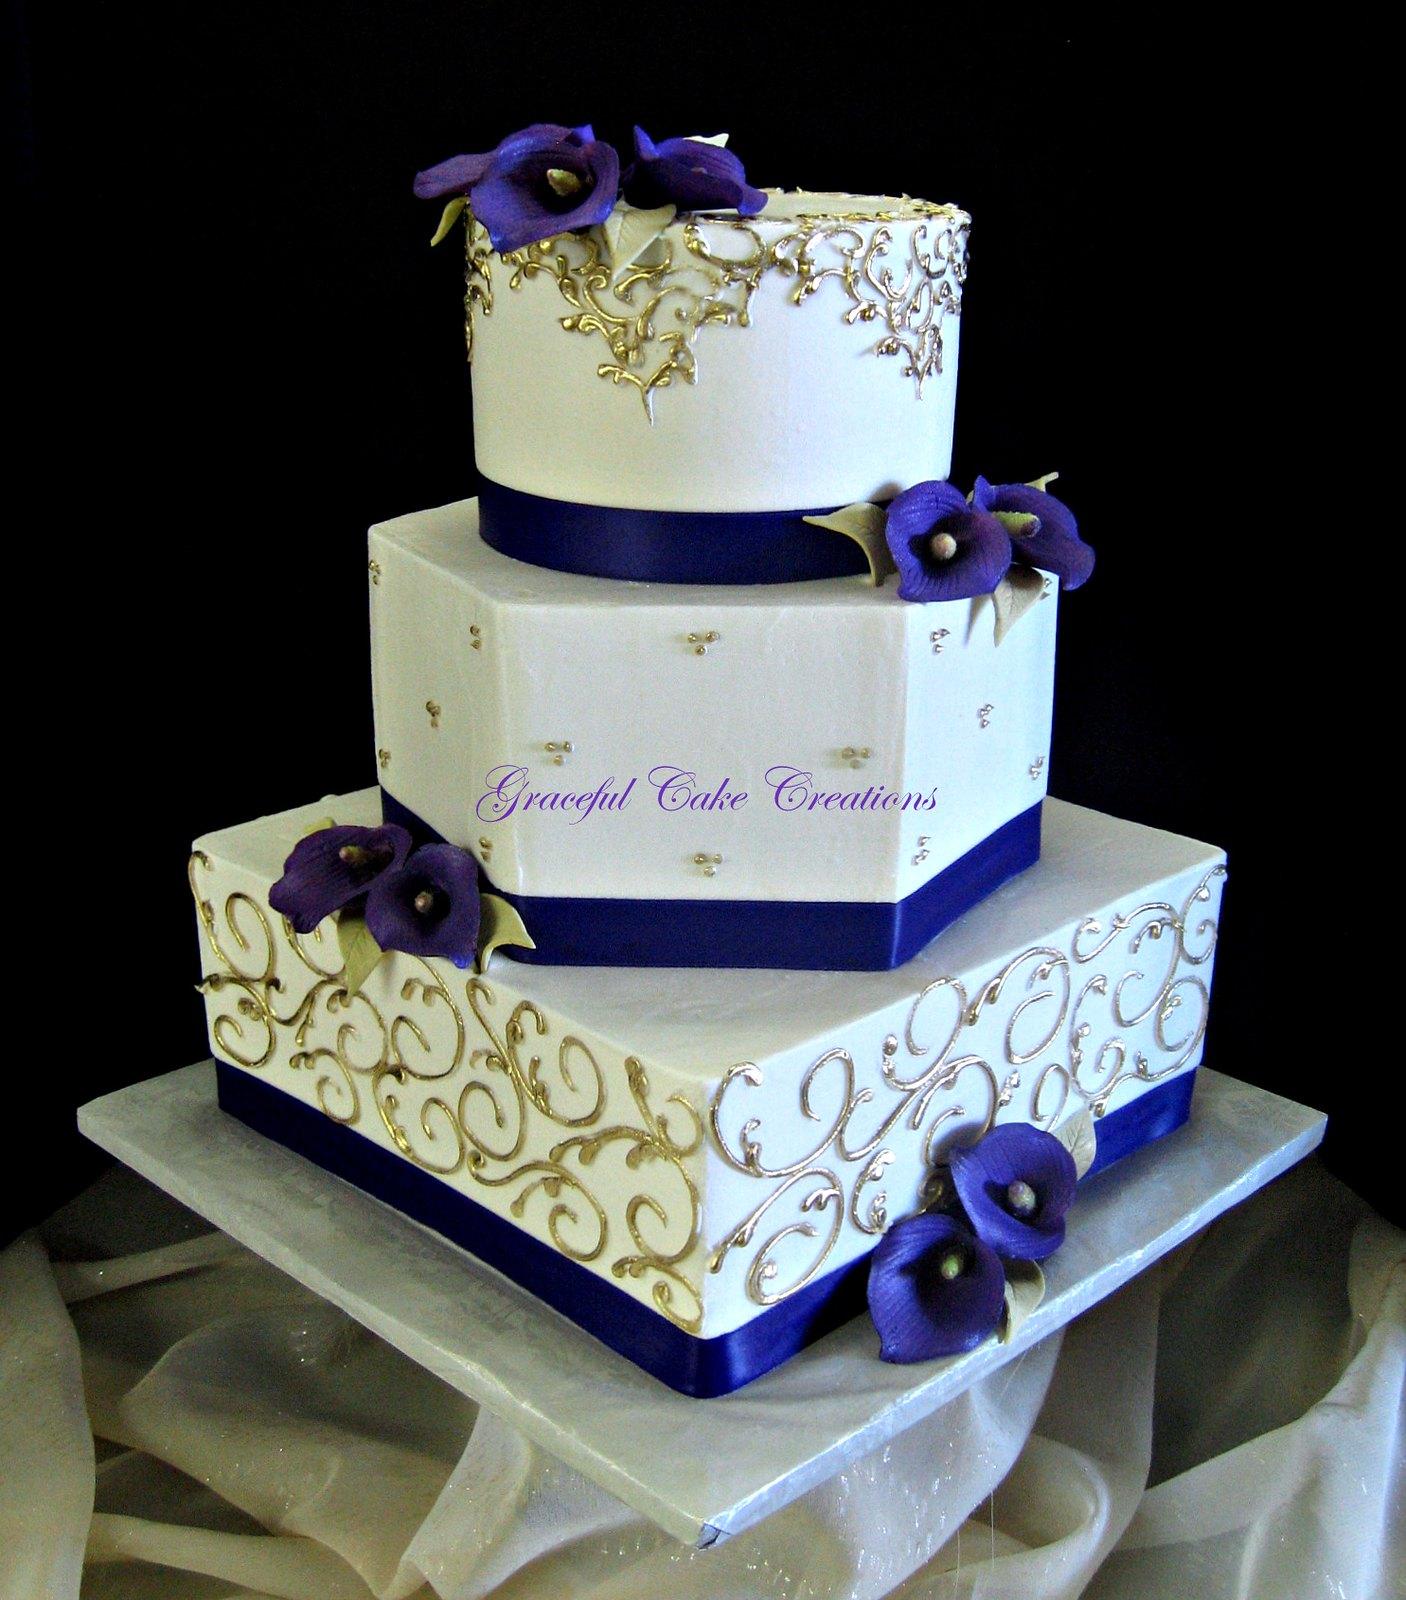 Elegant Ivory and Gold Wedding Cake with Purple Calla Lili